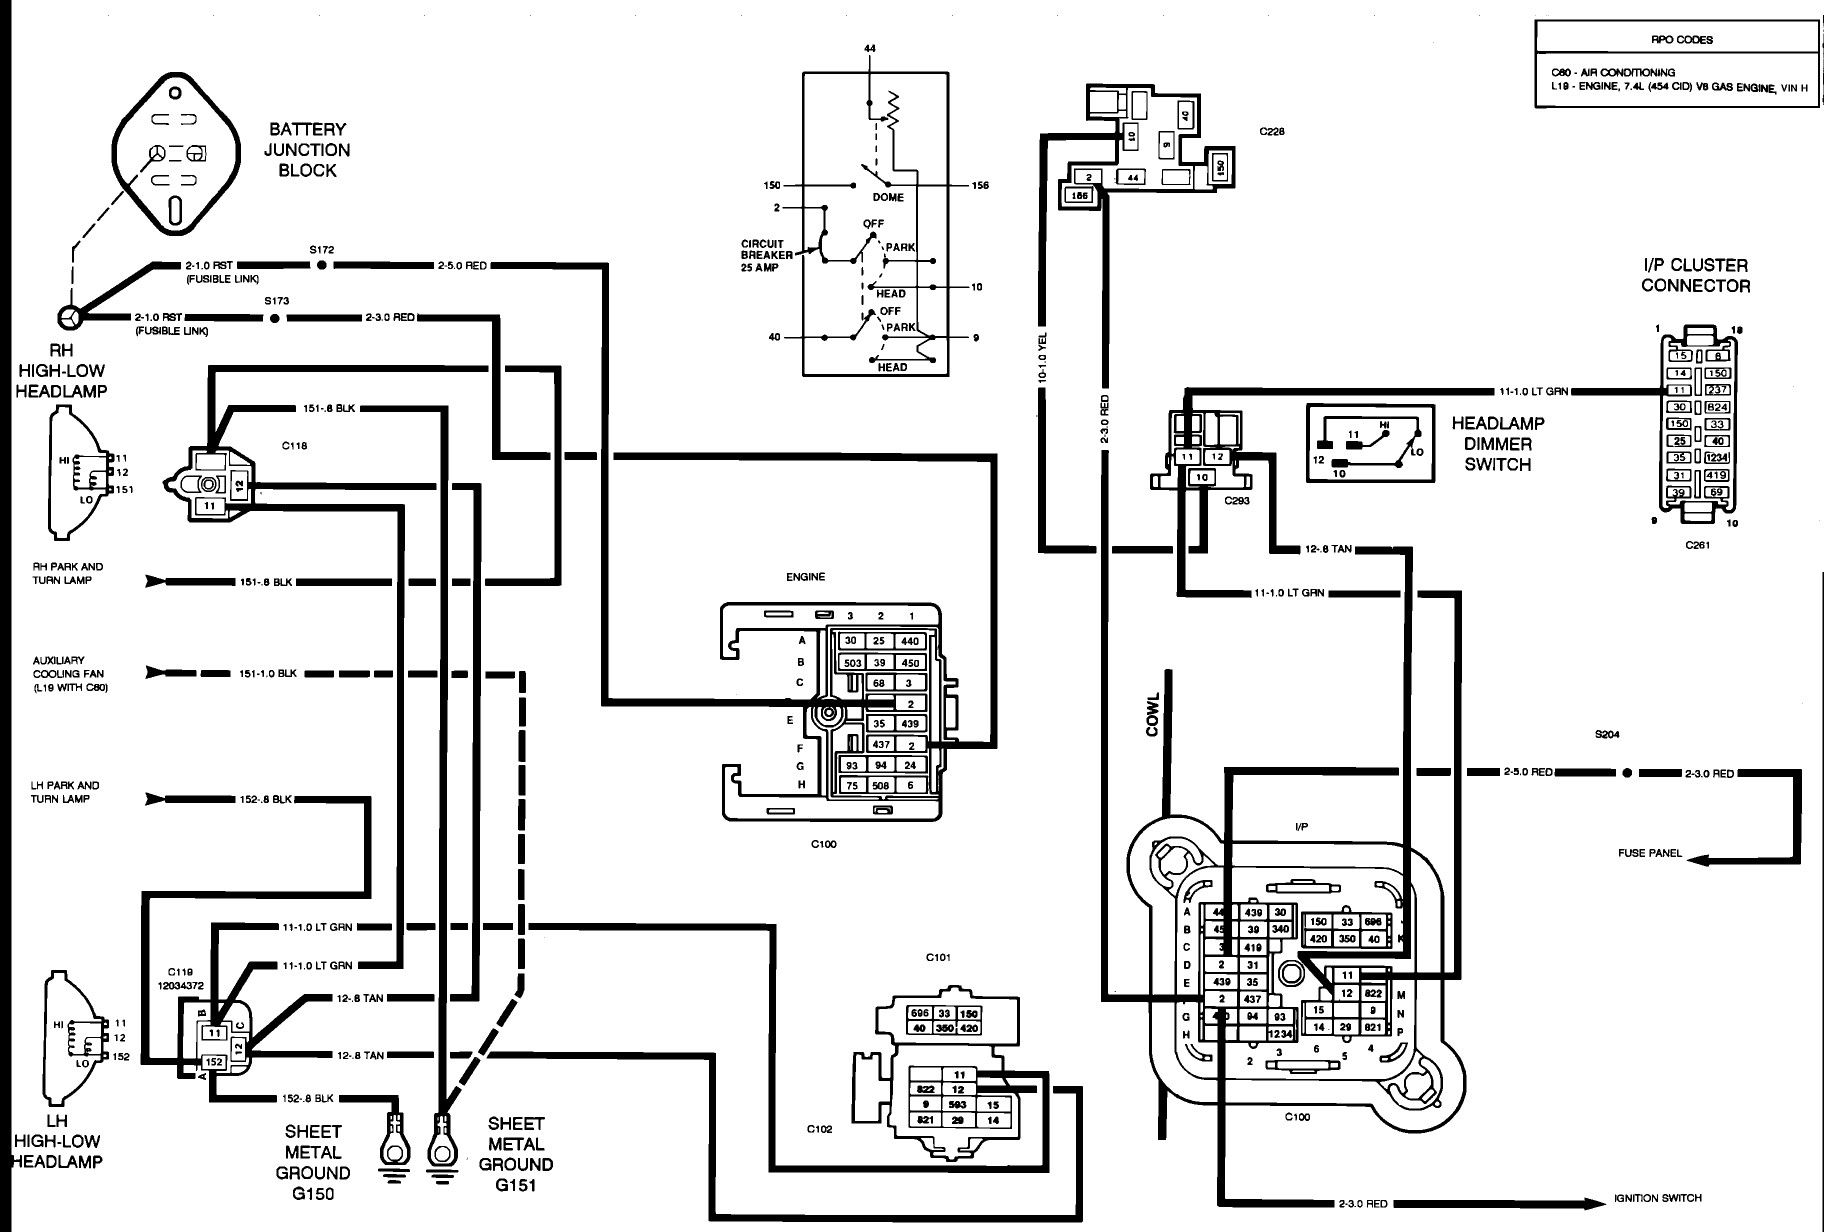 Ac Diagram Auto in 2021 | Chevy trucks, Remote car starter, DiagramPinterest